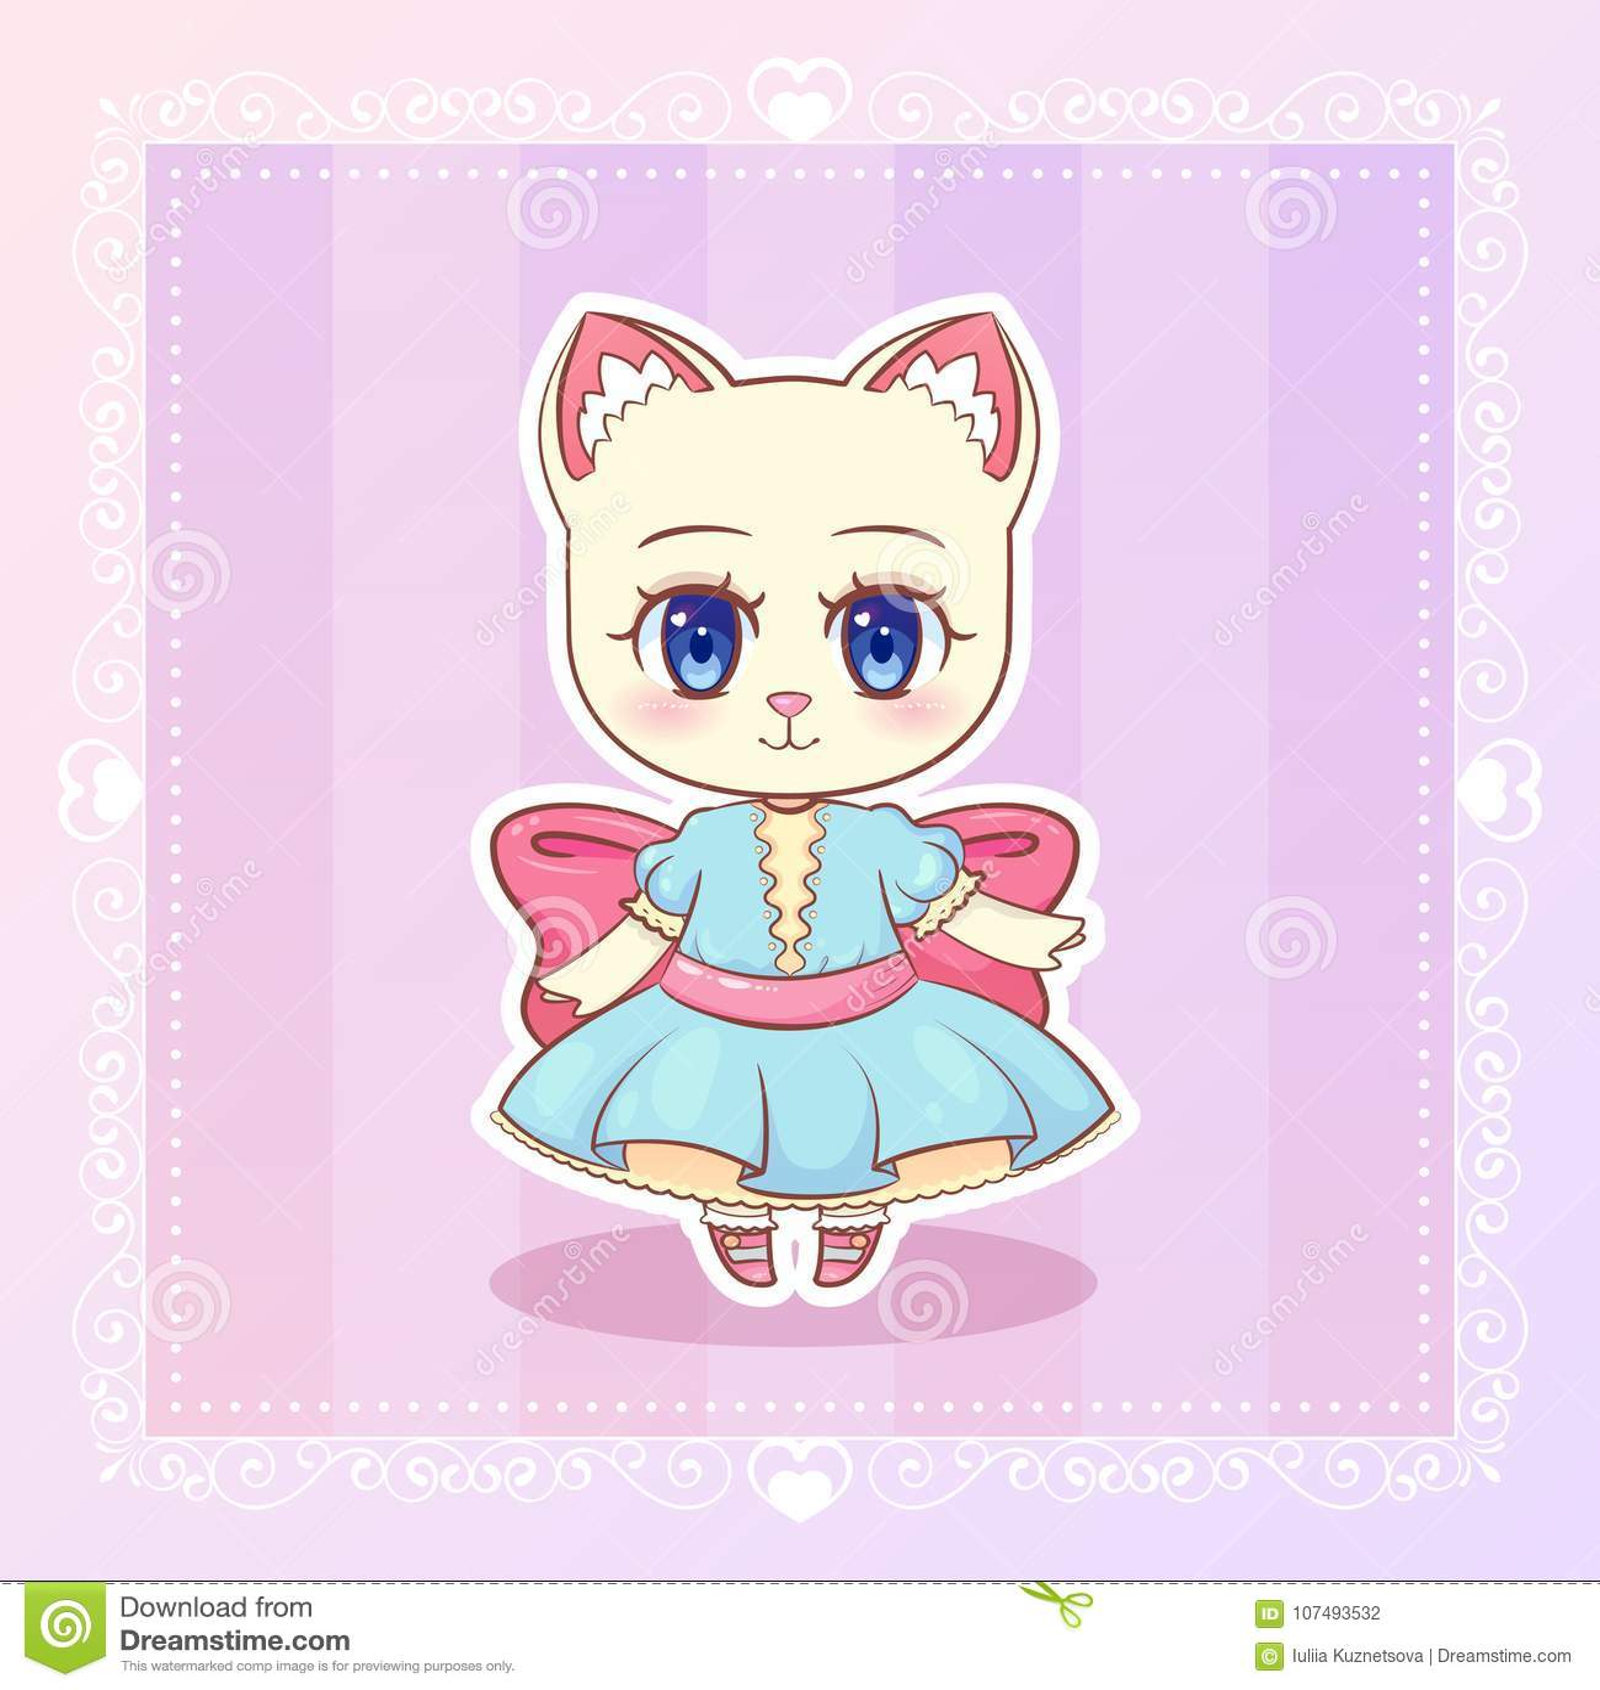 Sweet kitty little cat cute kawaii anime cartoon kitten girl in dress with pink ribbon